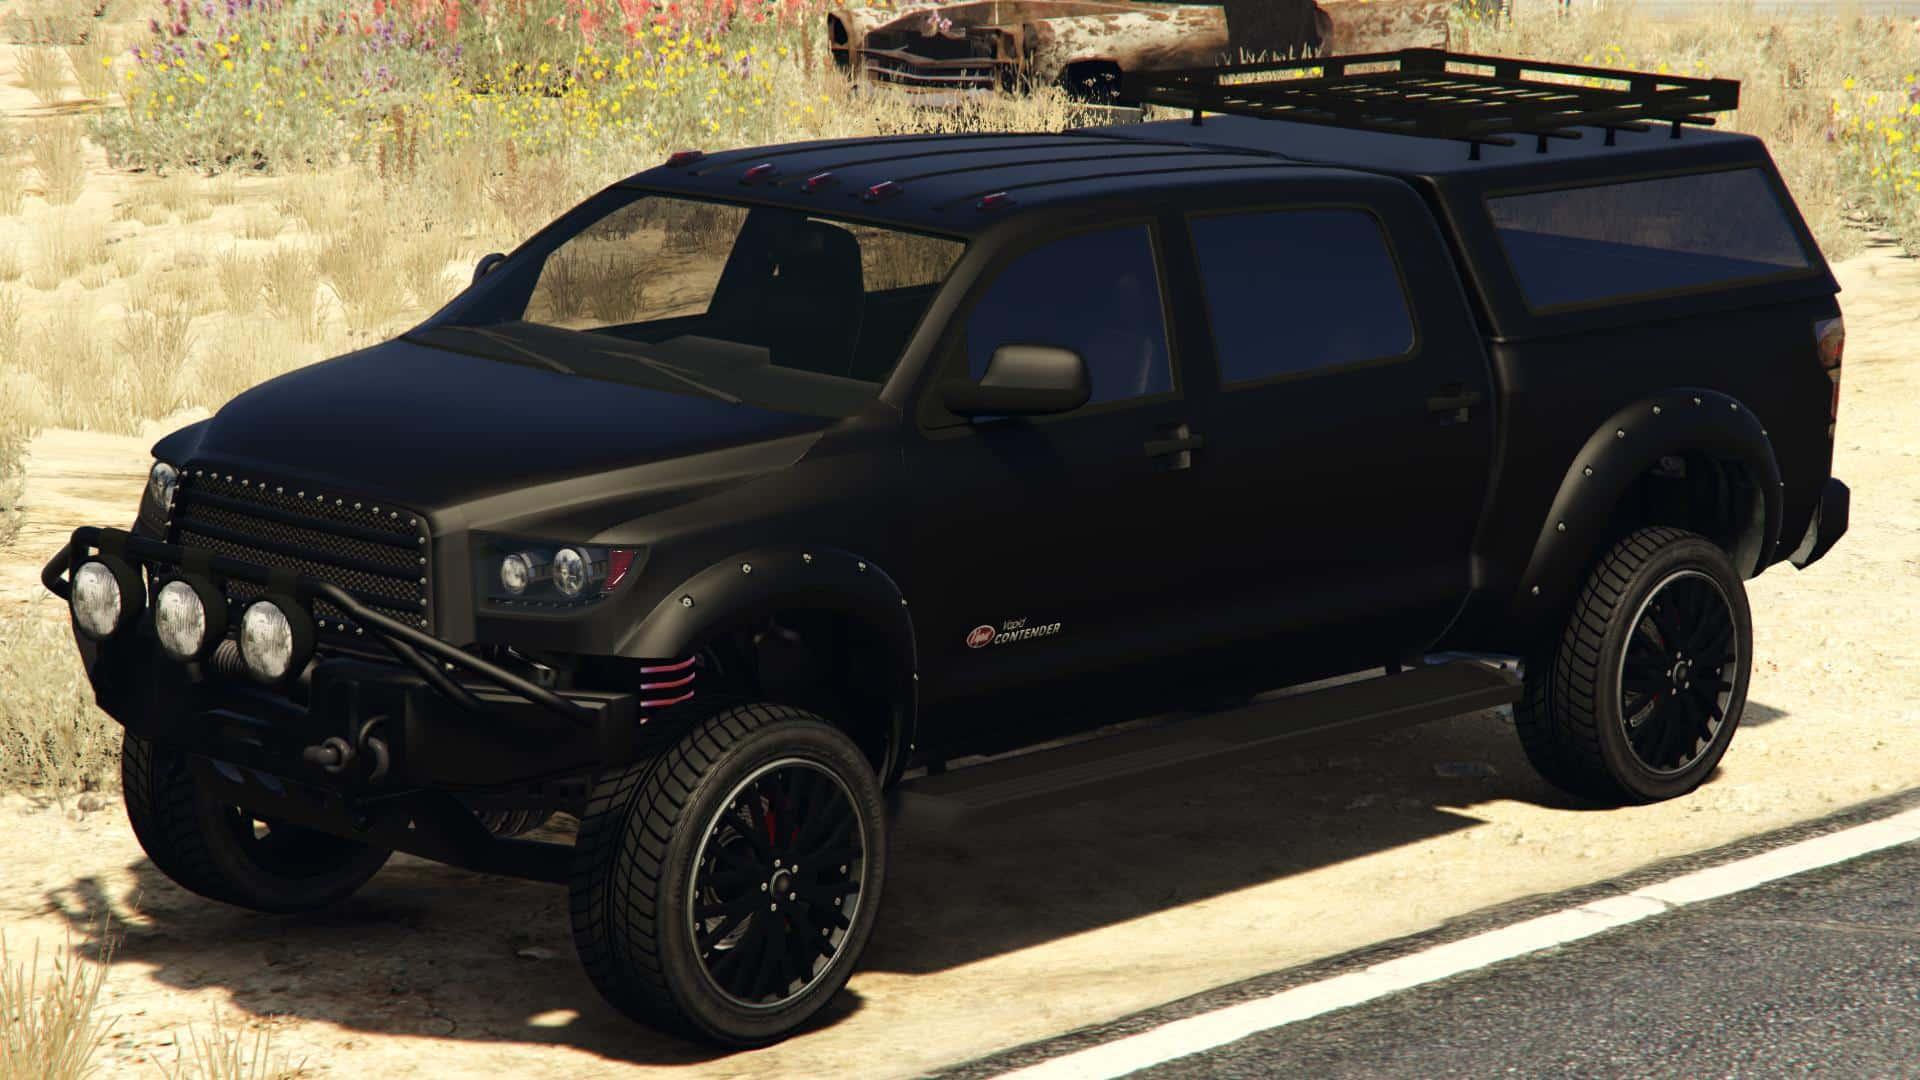 gta online upcoming vehicles gta 5 cheats. Black Bedroom Furniture Sets. Home Design Ideas